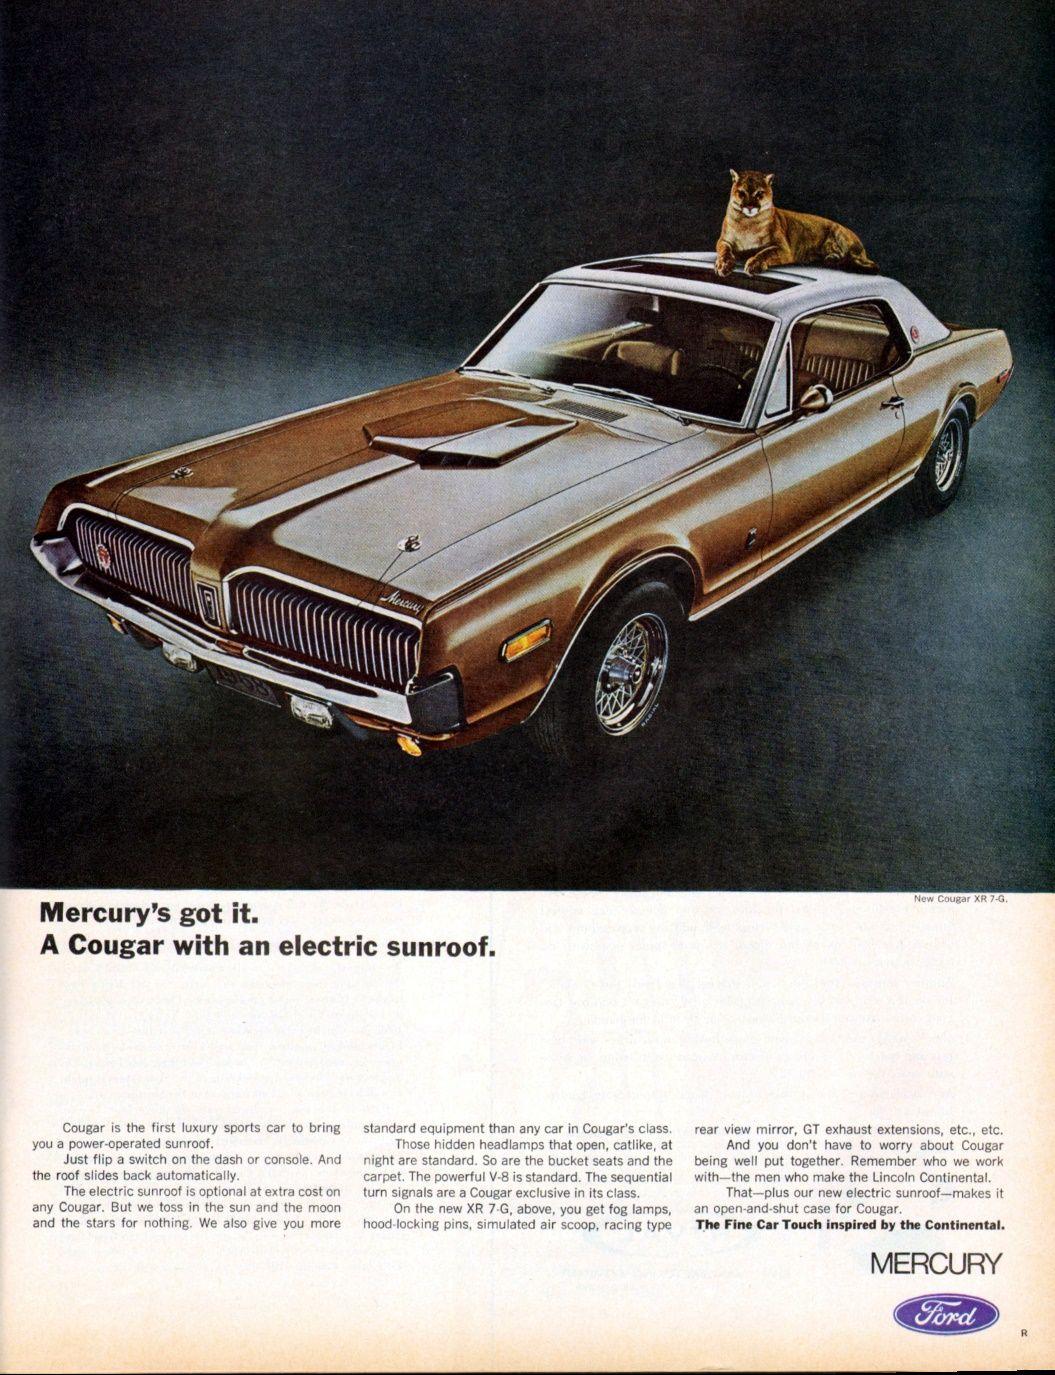 1968 Mercury Cougar | Chevrolet corvette classic cars | Pinterest ...